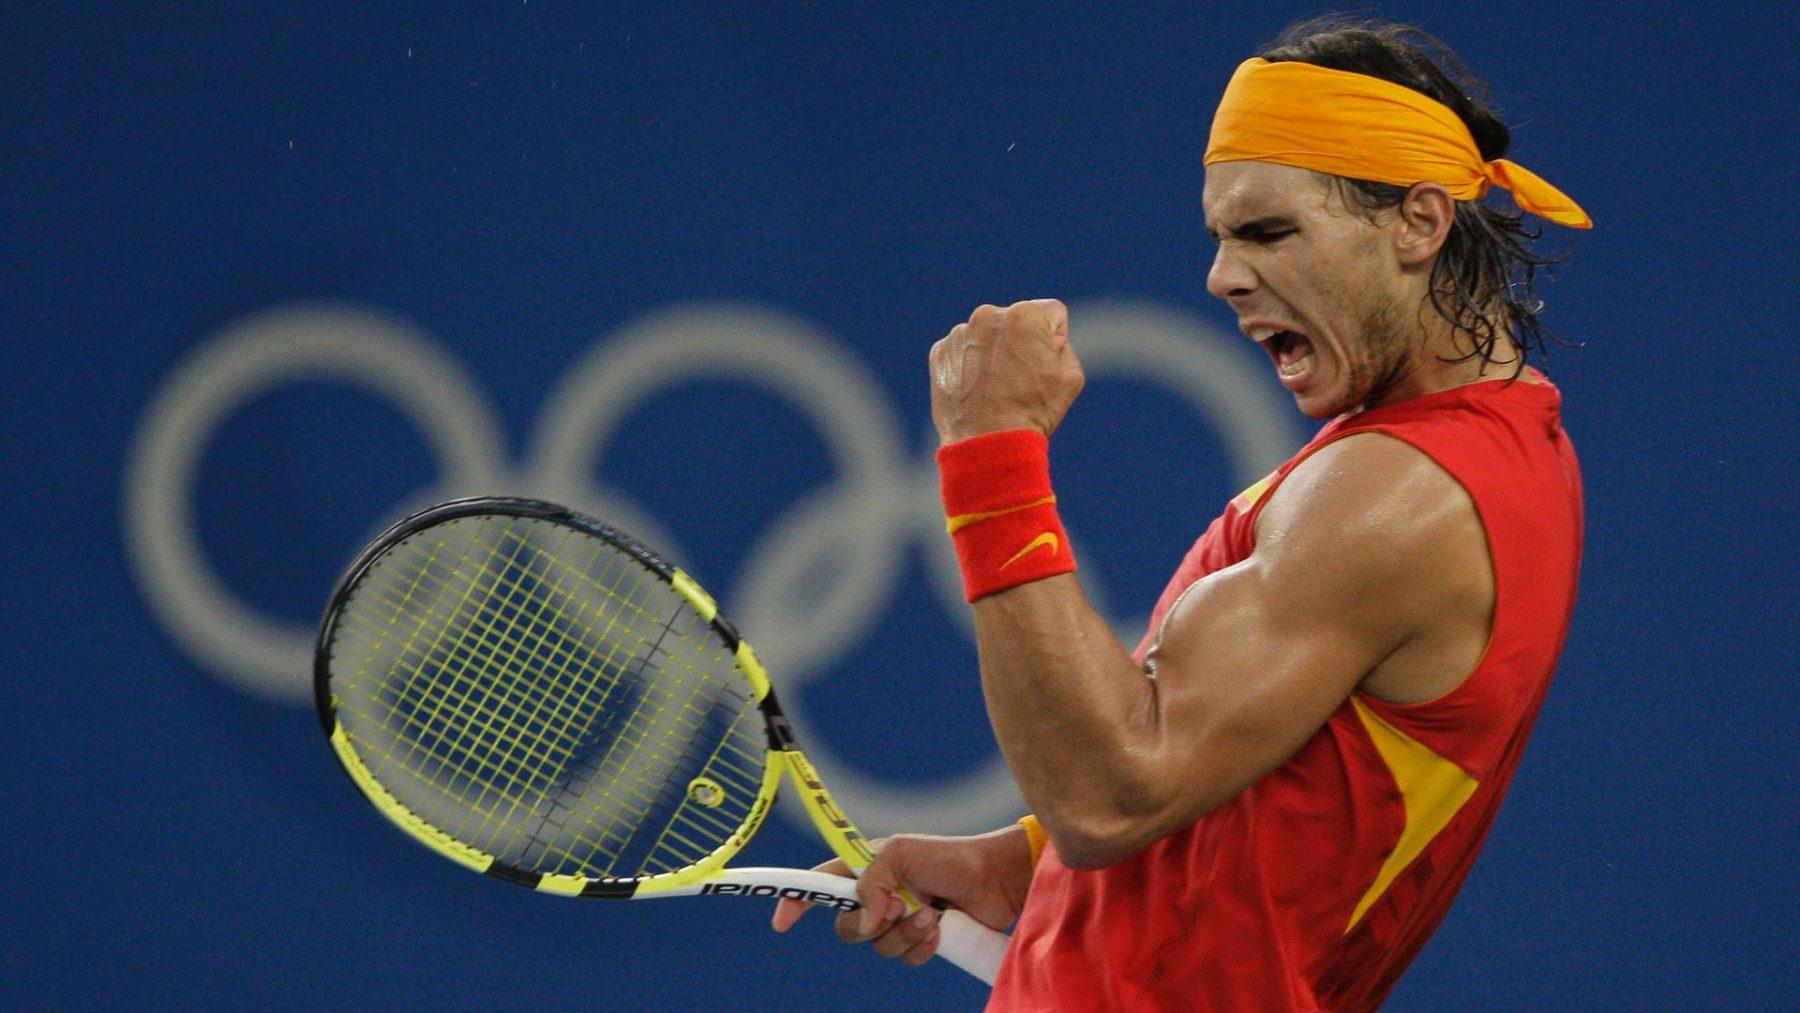 Rafael Nadal Hd Wallpapers 7wallpapers Net